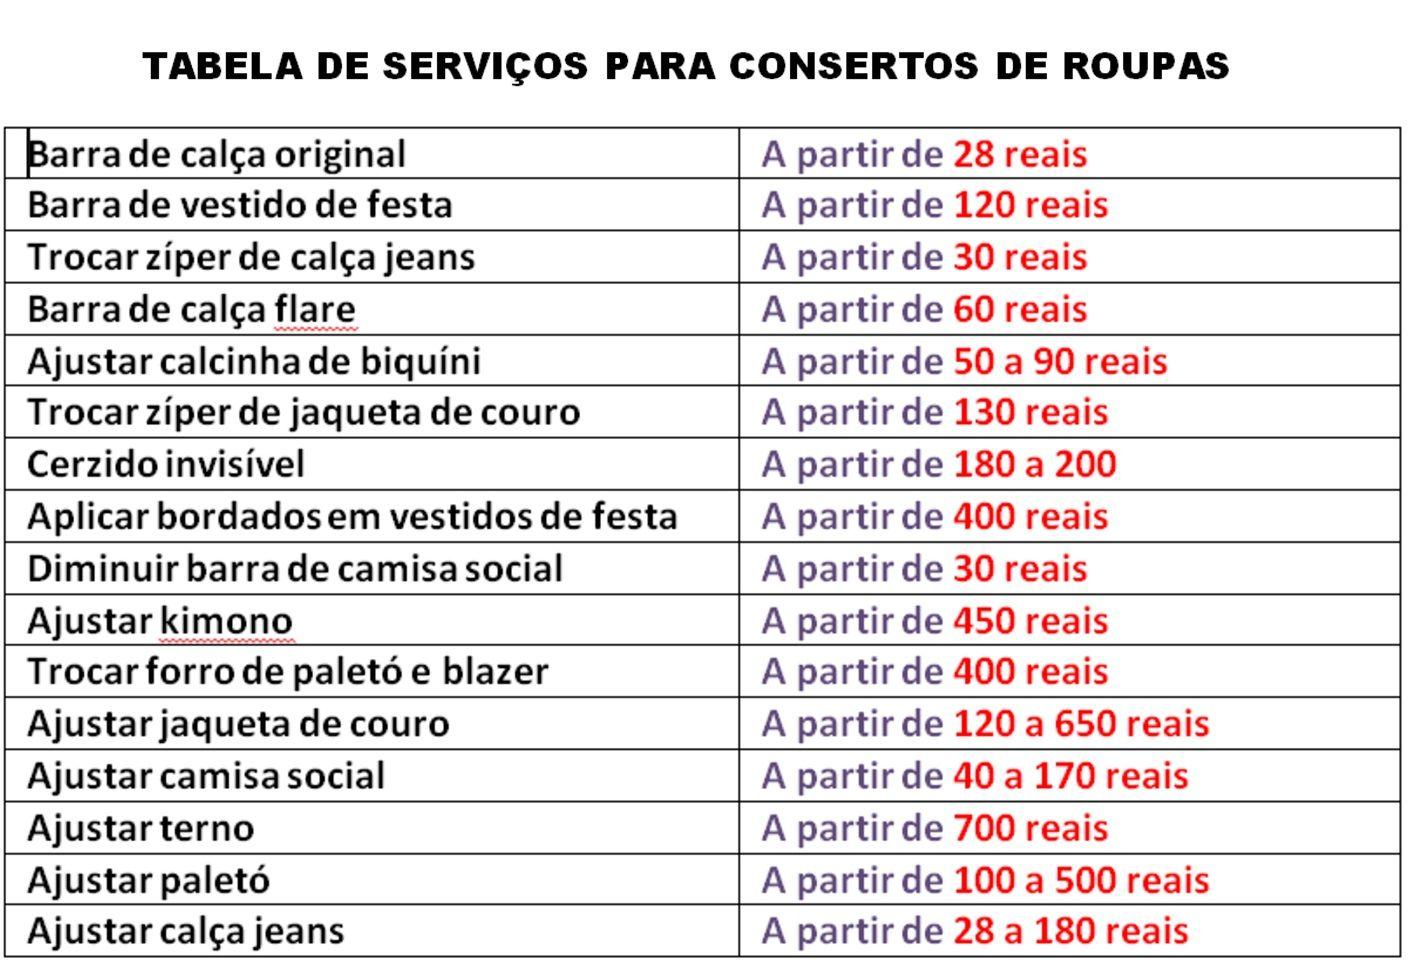 tabela de servicos para conserto de roupas precos